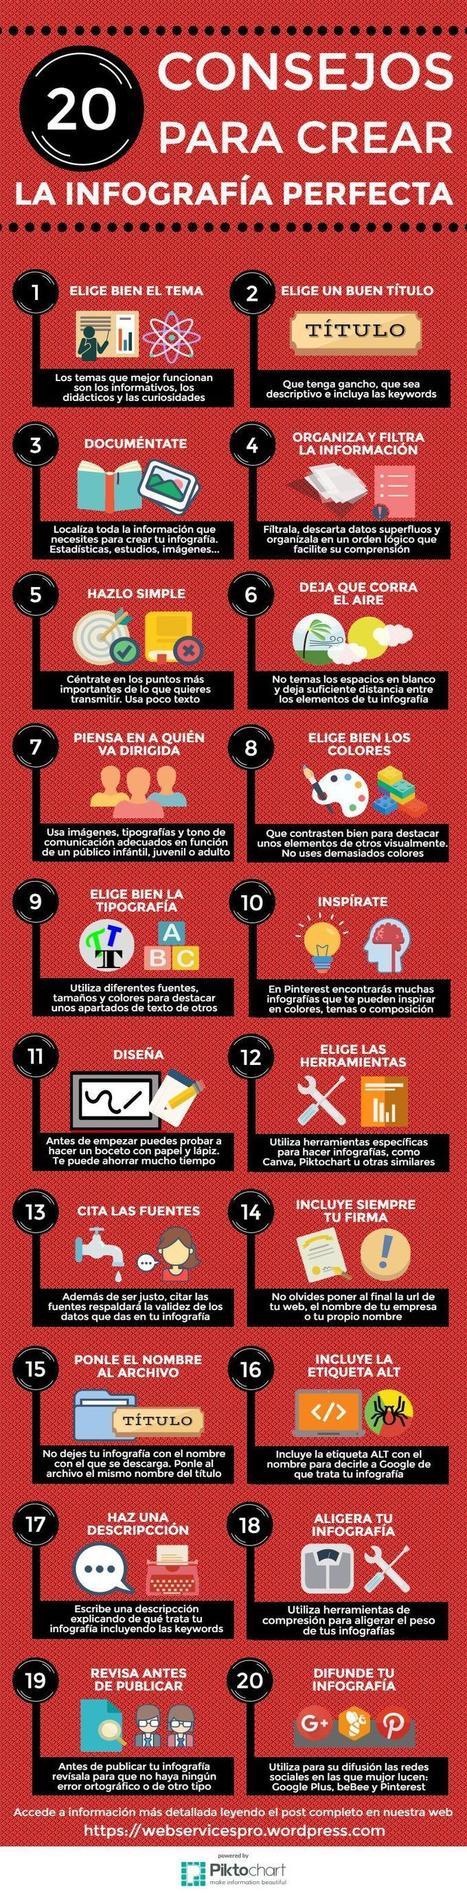 20 consejos para crear la infografía perfecta #infografia #infographic | ikt-Arizmendi | Scoop.it